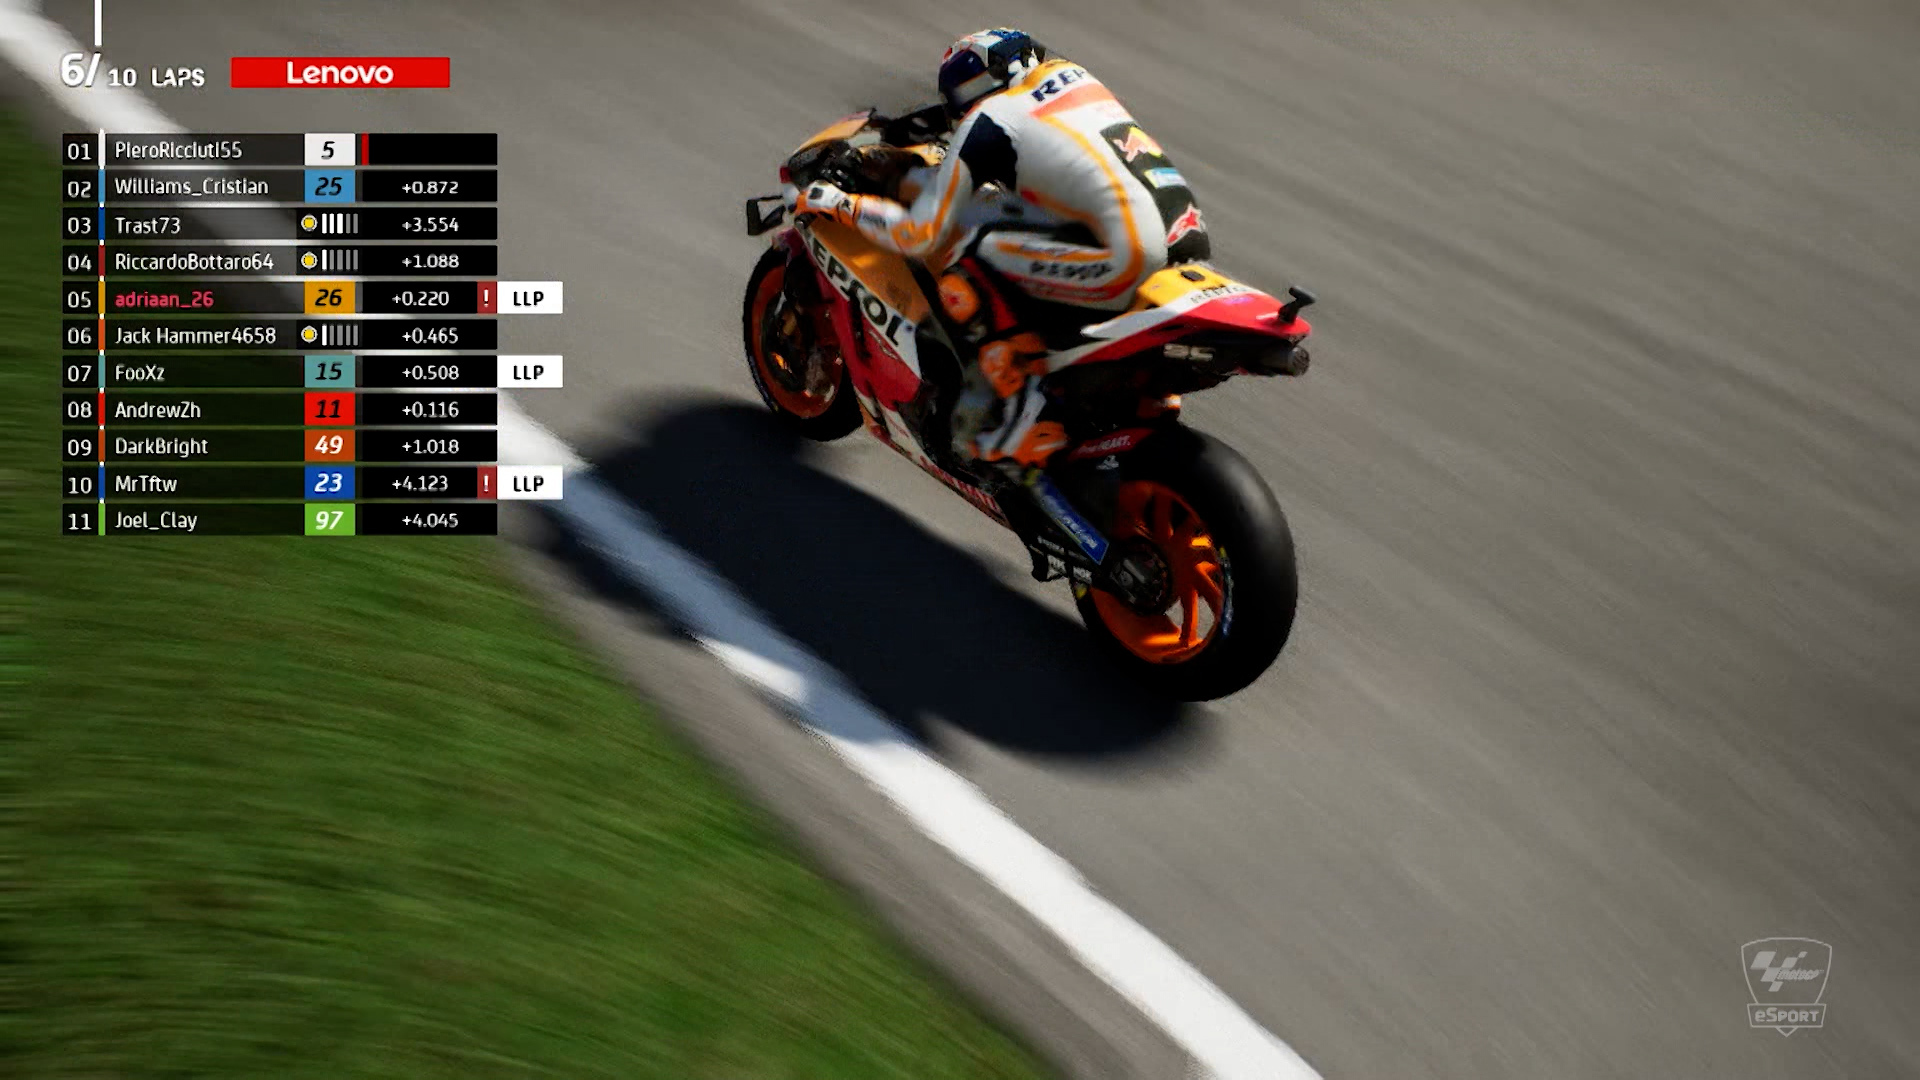 2021_MotoGP_00_GS2_eSPORTS_GLOBALSERIES_ROUND_02_PGM.00_46_00_19.Imagen-fija008